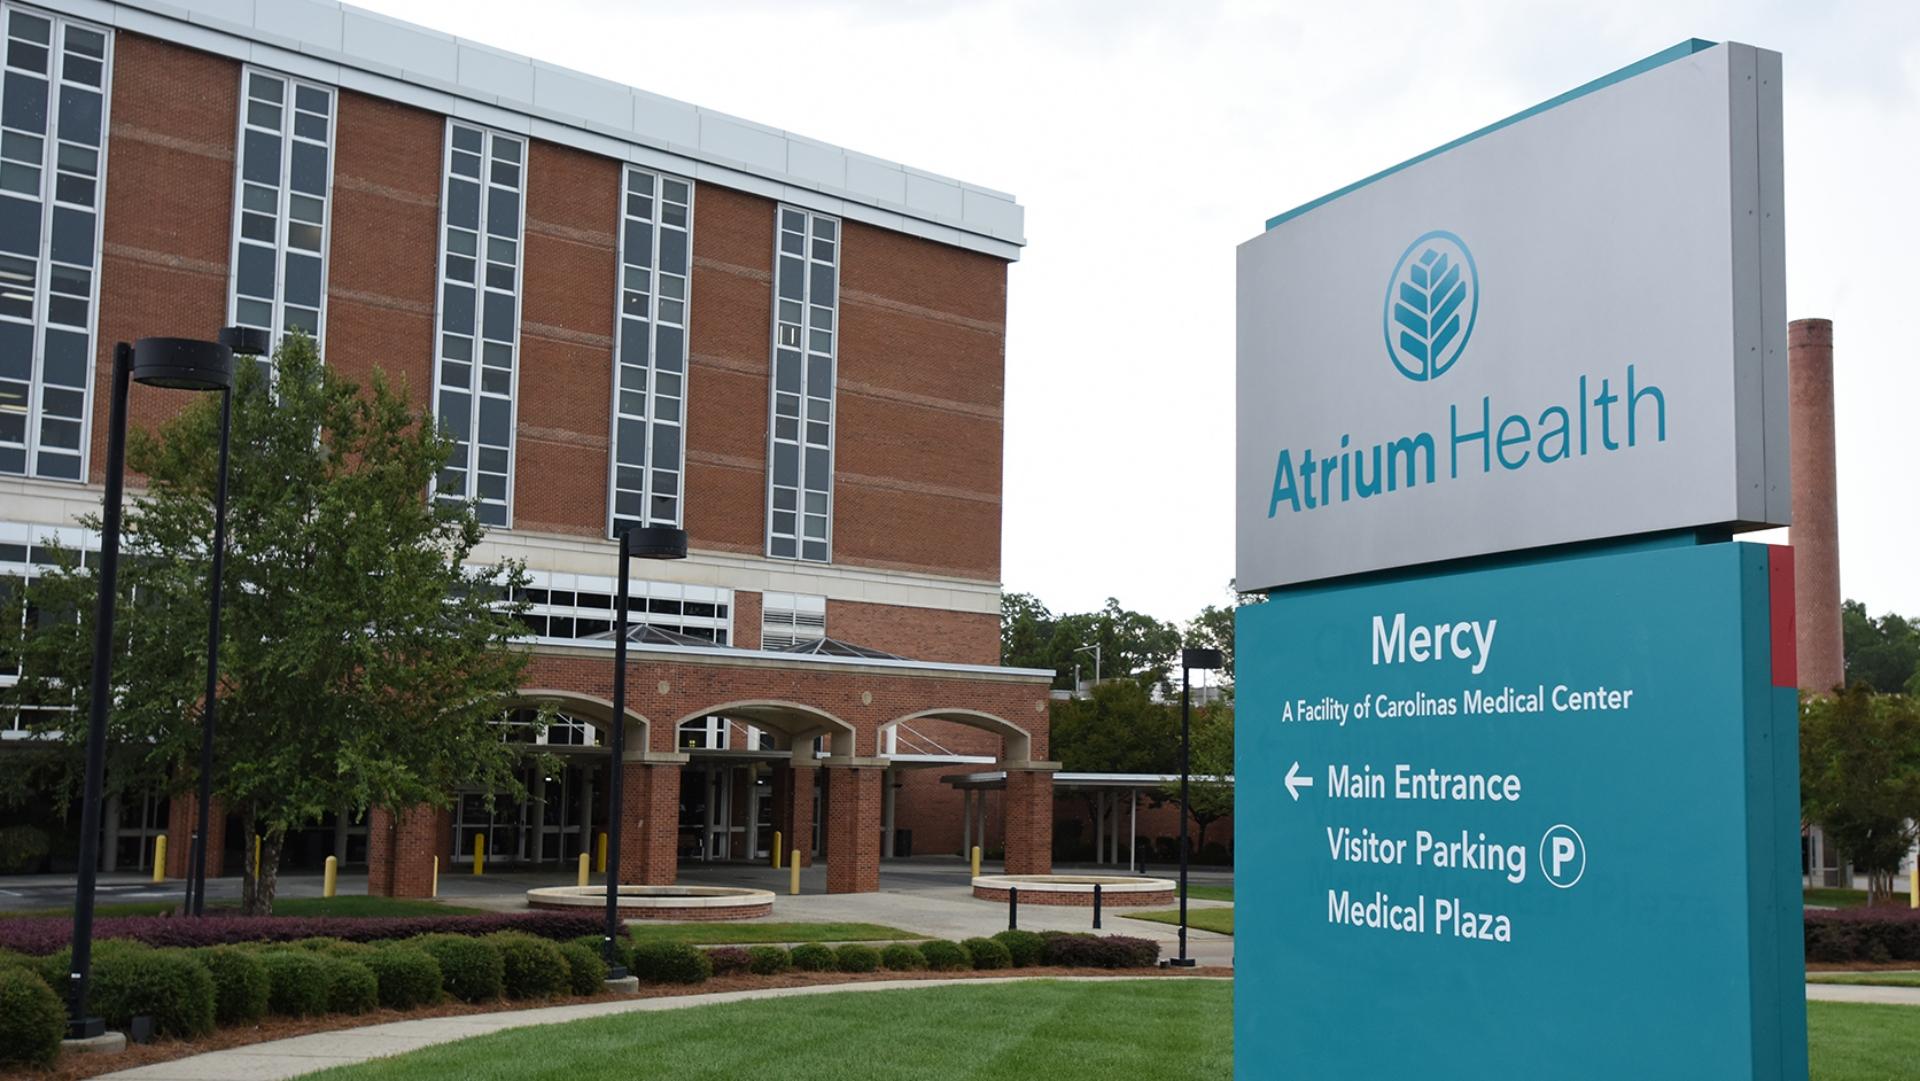 The Arbor Day Foundation has named Atrium Health Mercy a Tree Campus Healthcare facility.